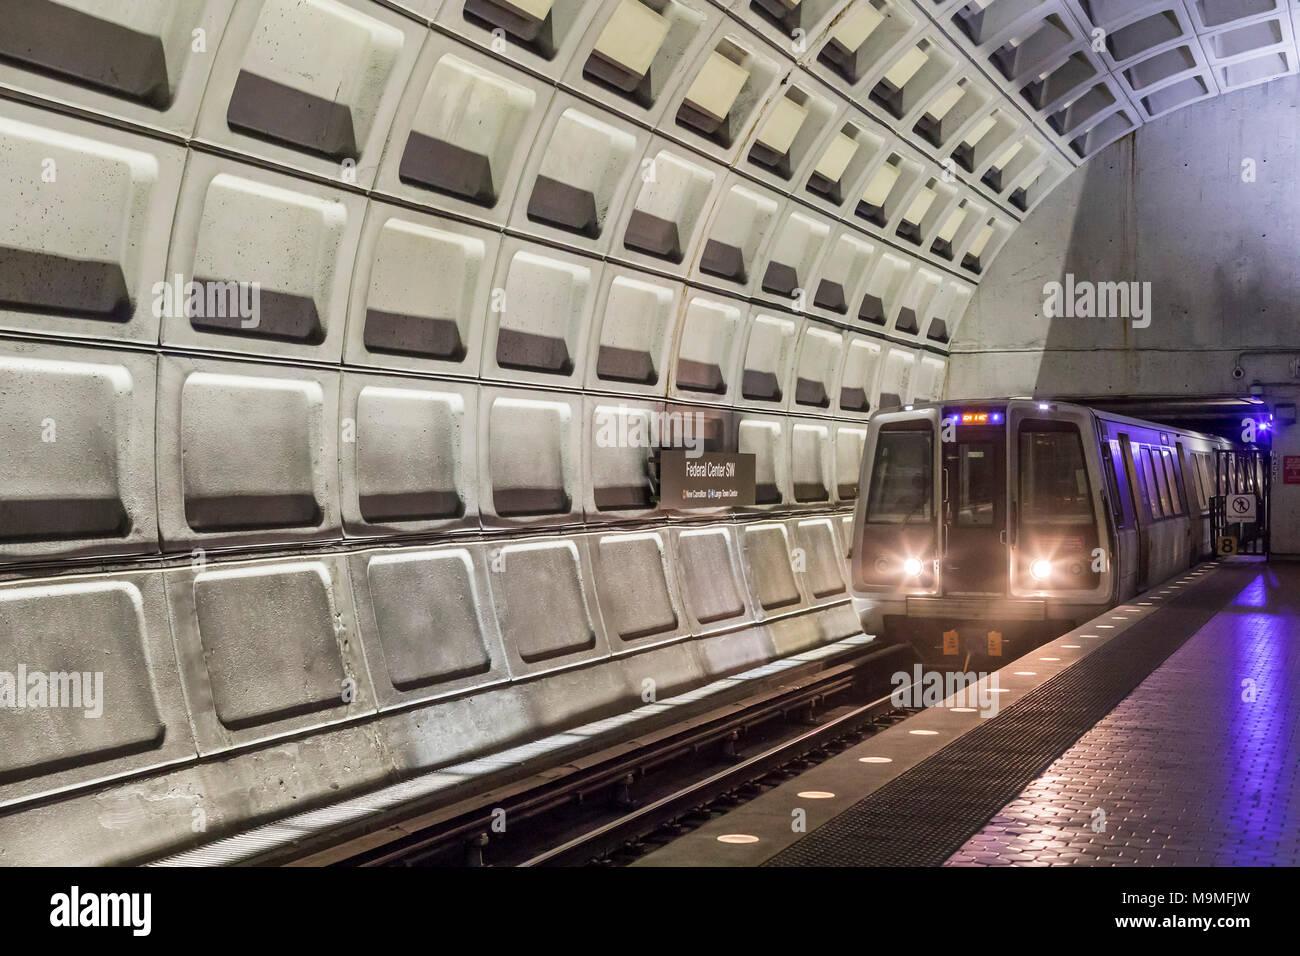 Washington, DC - ein Washington Metro U-Bahn Zug kommt an der Federal Center SW-Station. Stockbild